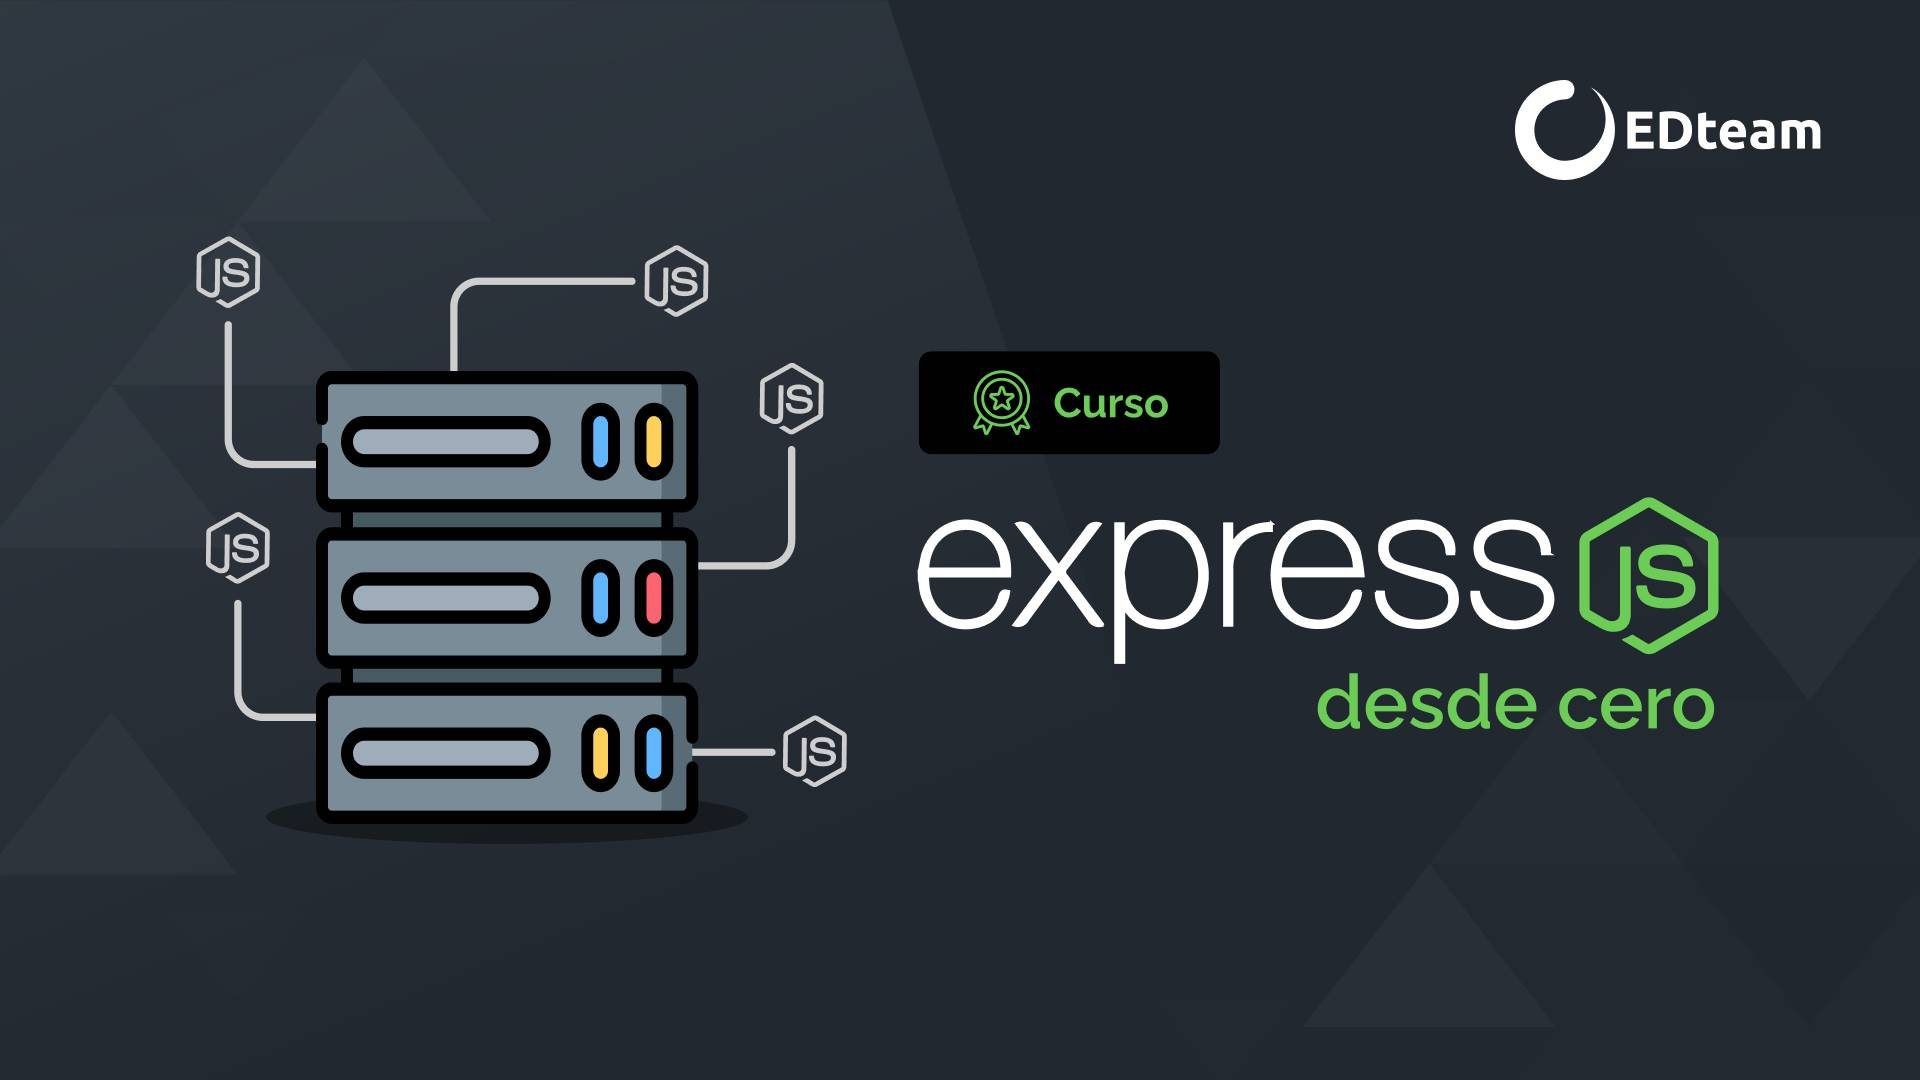 Express desde cero